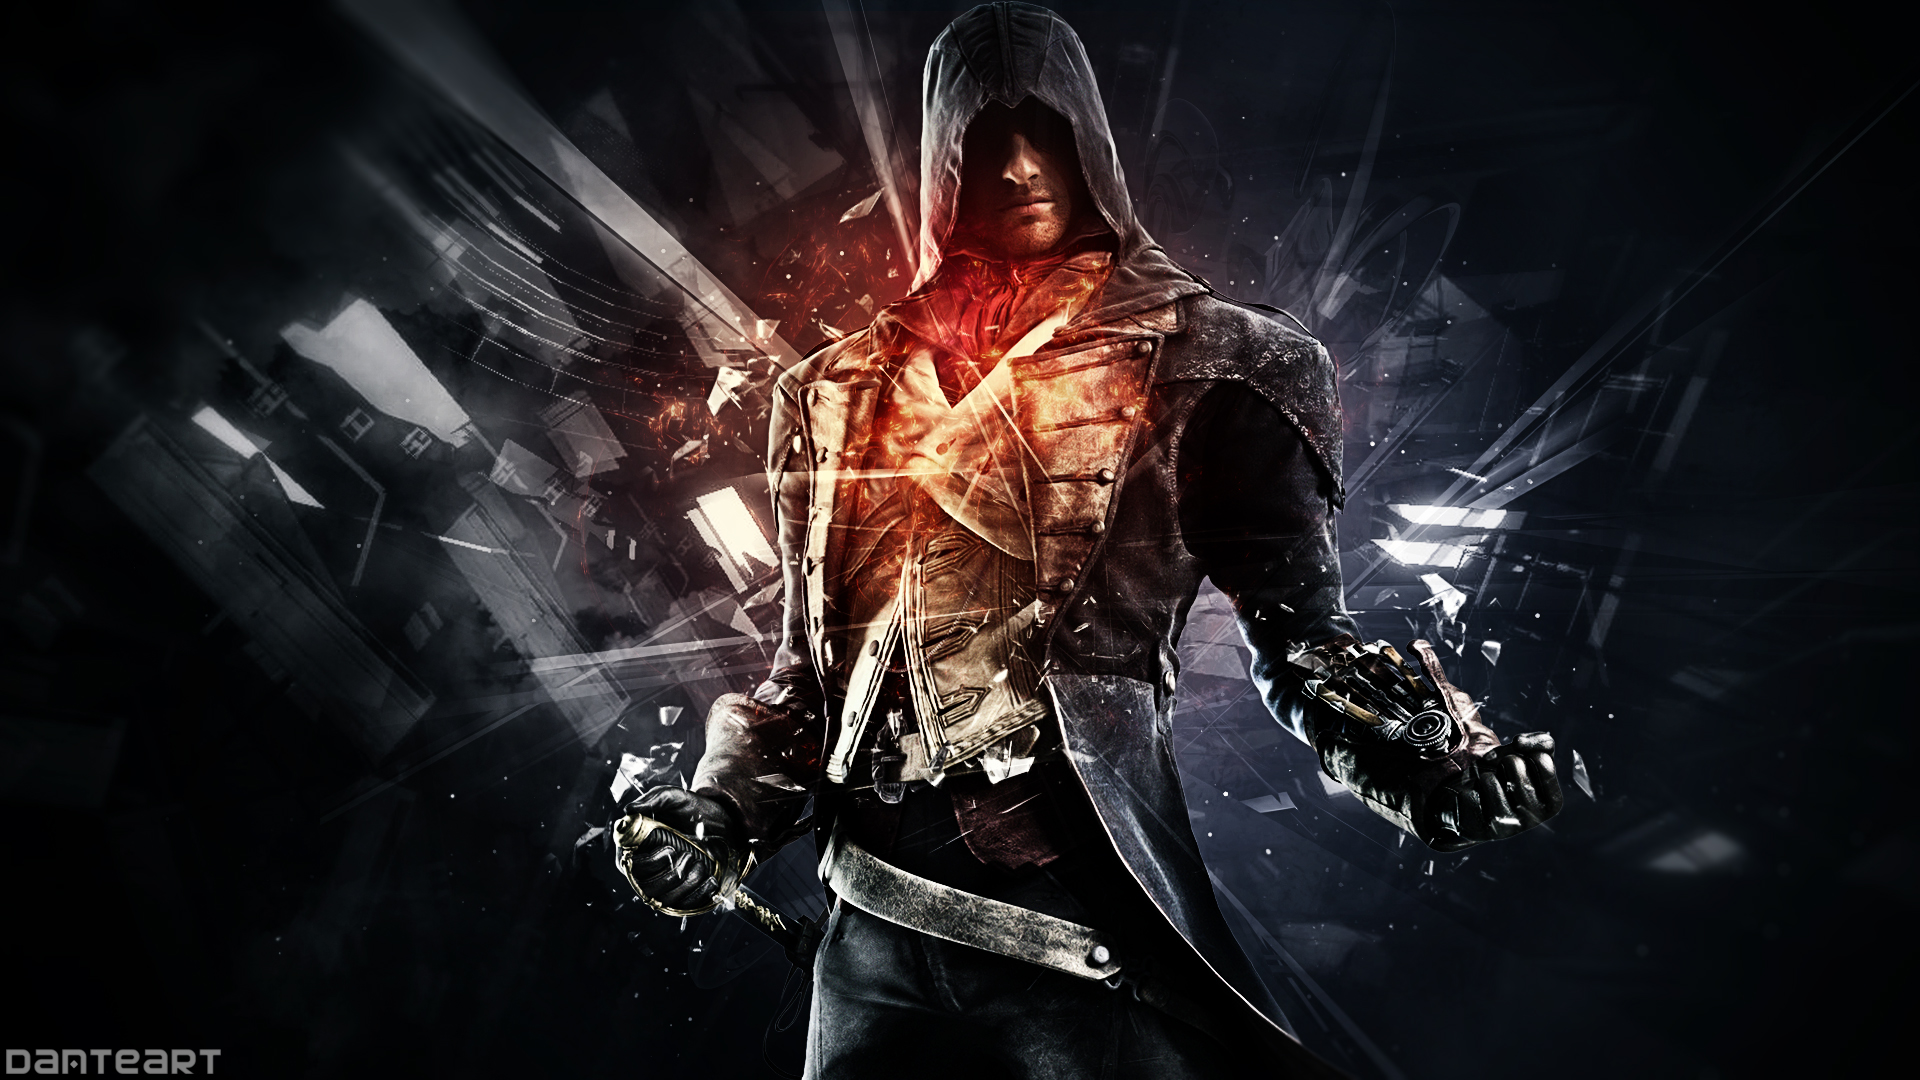 Assassin S Creed Unity Wallpaper By Danteartwallpapers On Deviantart